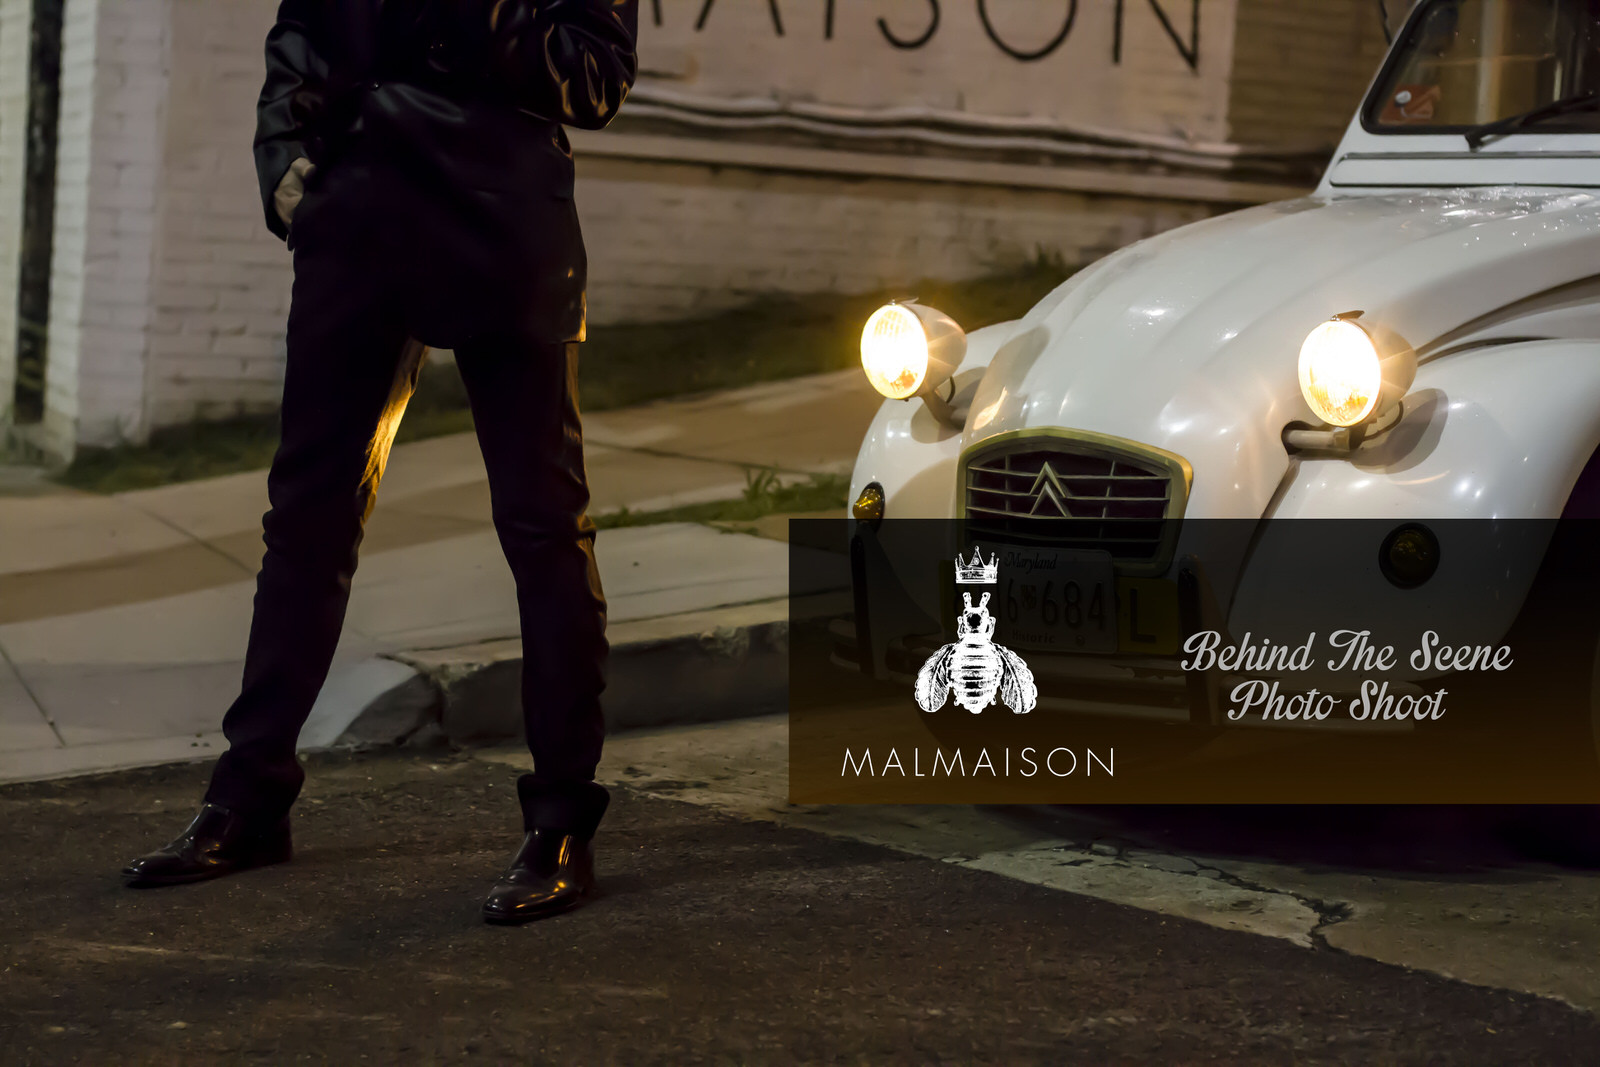 Malmaison – Behind the scene photo shoot